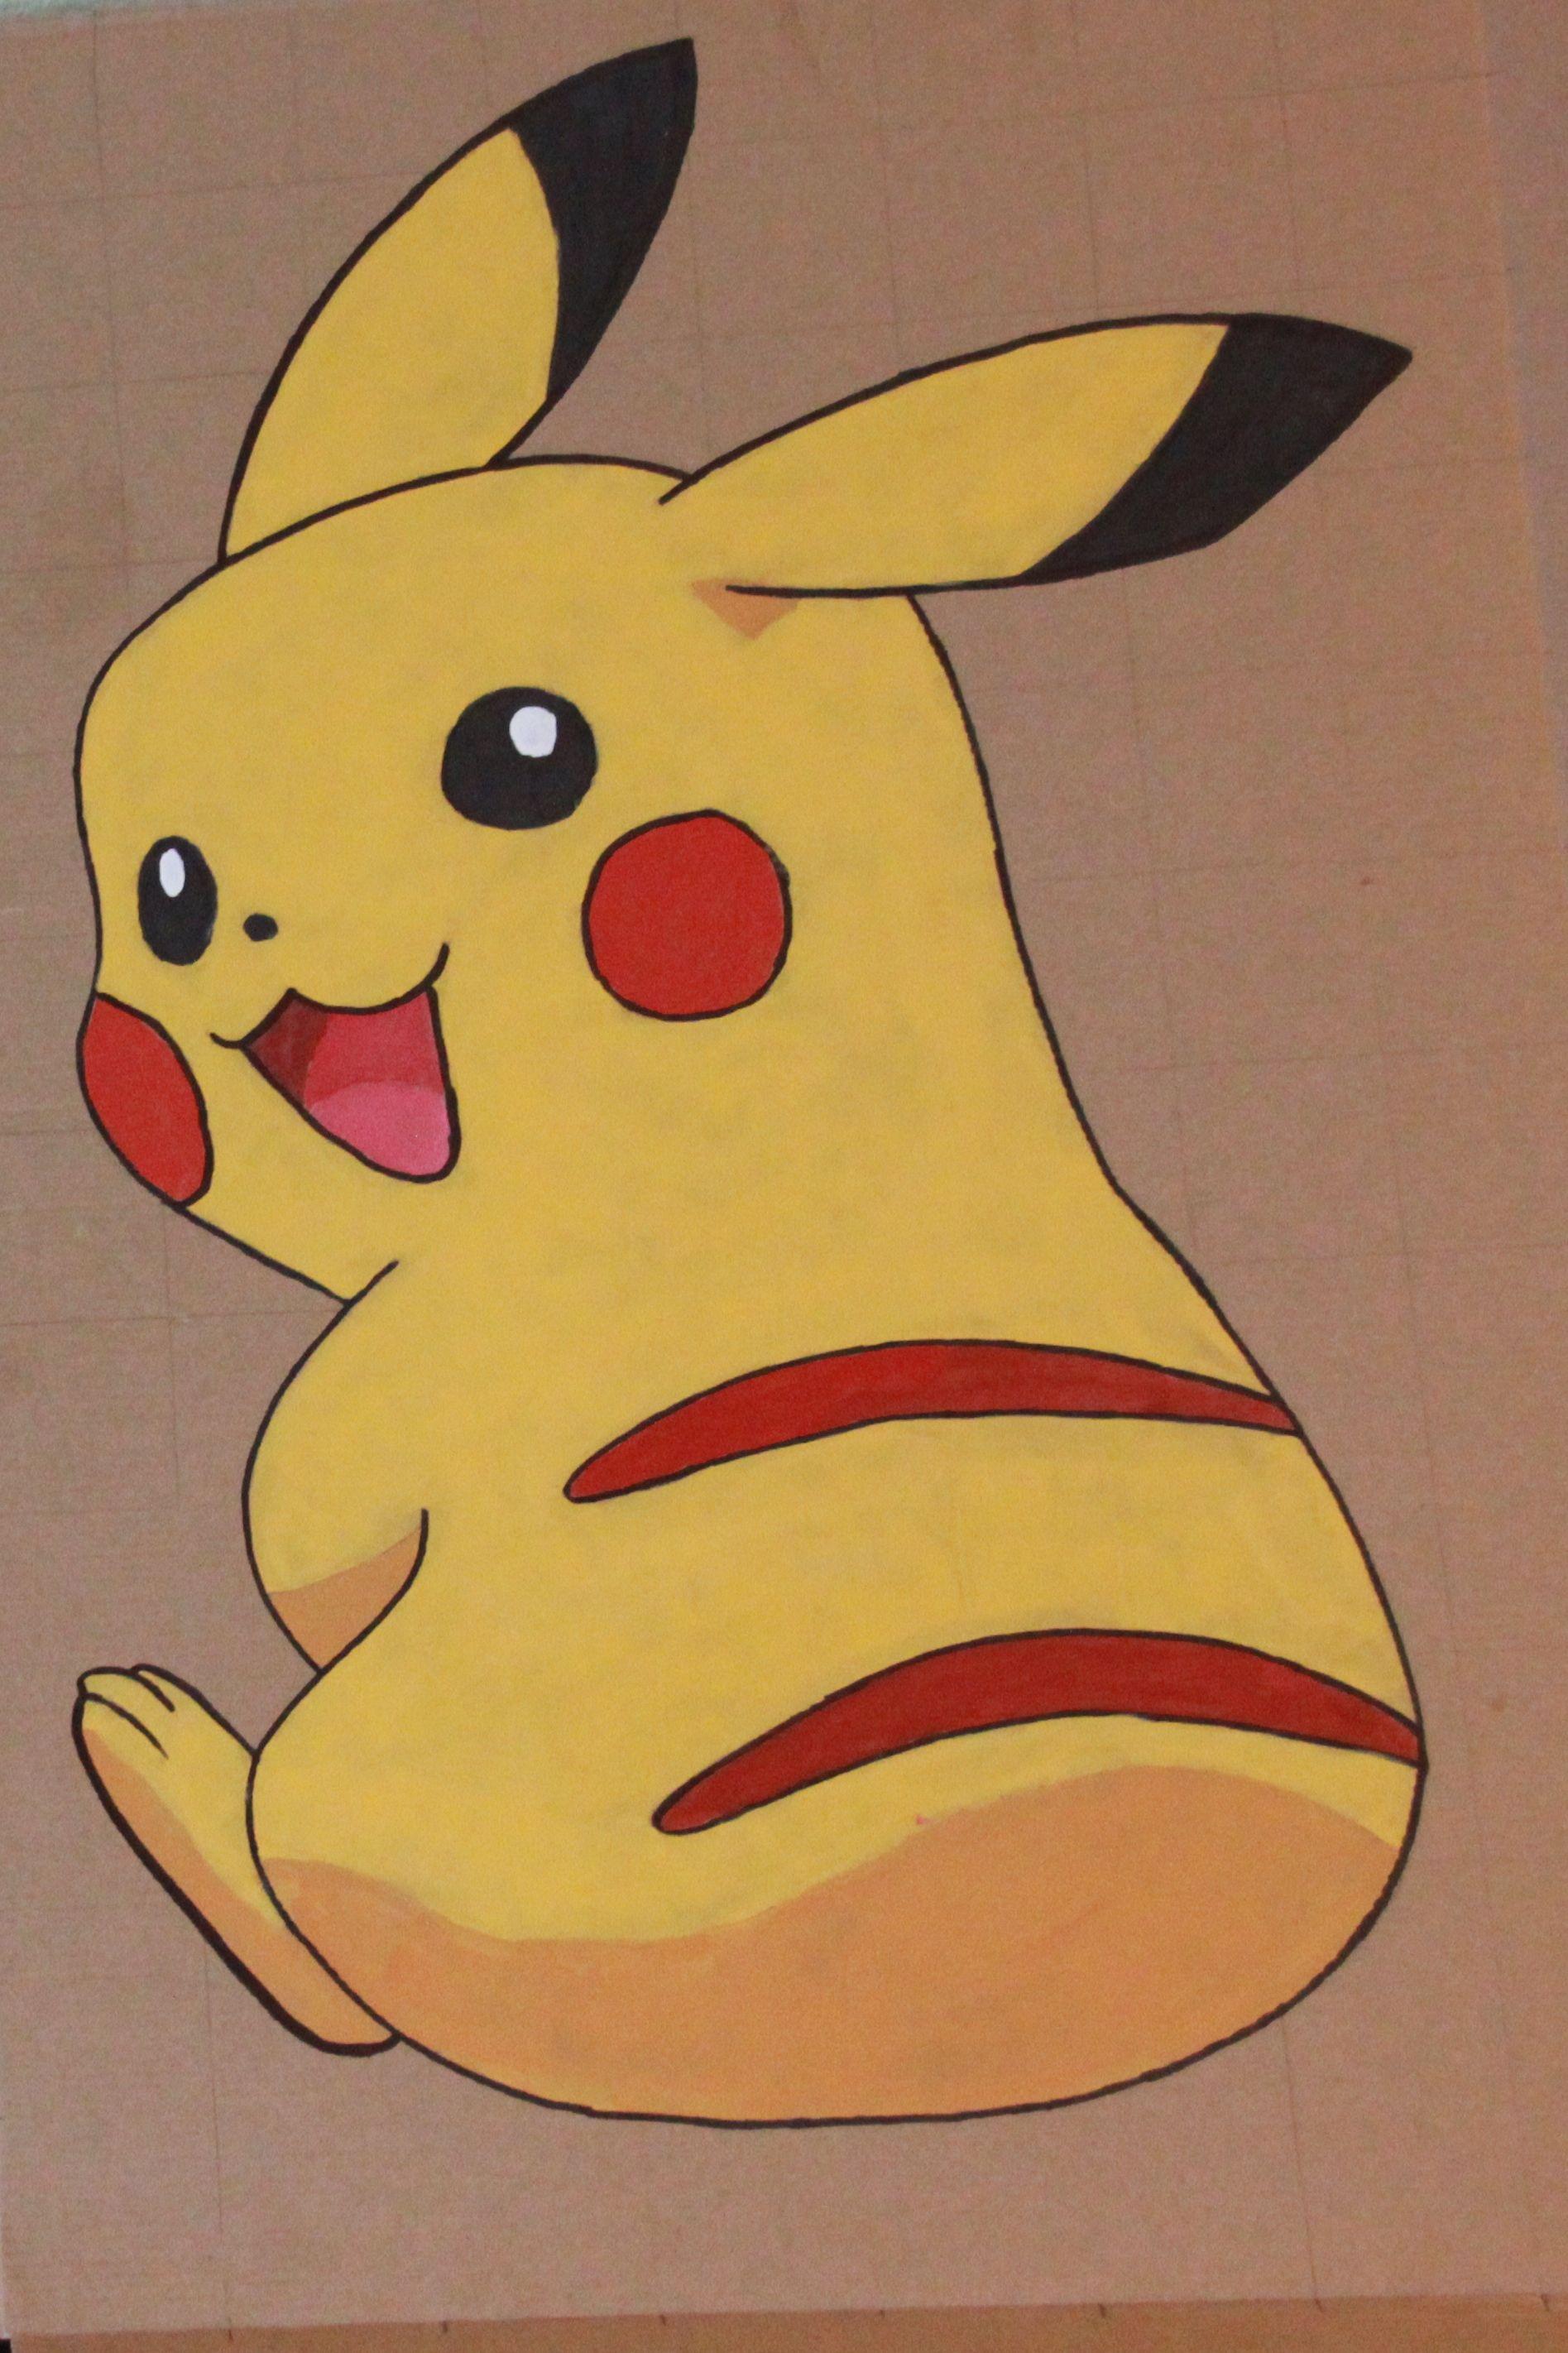 Pin The Tail On Pikachu Game Pokemon Birthday Pinterest